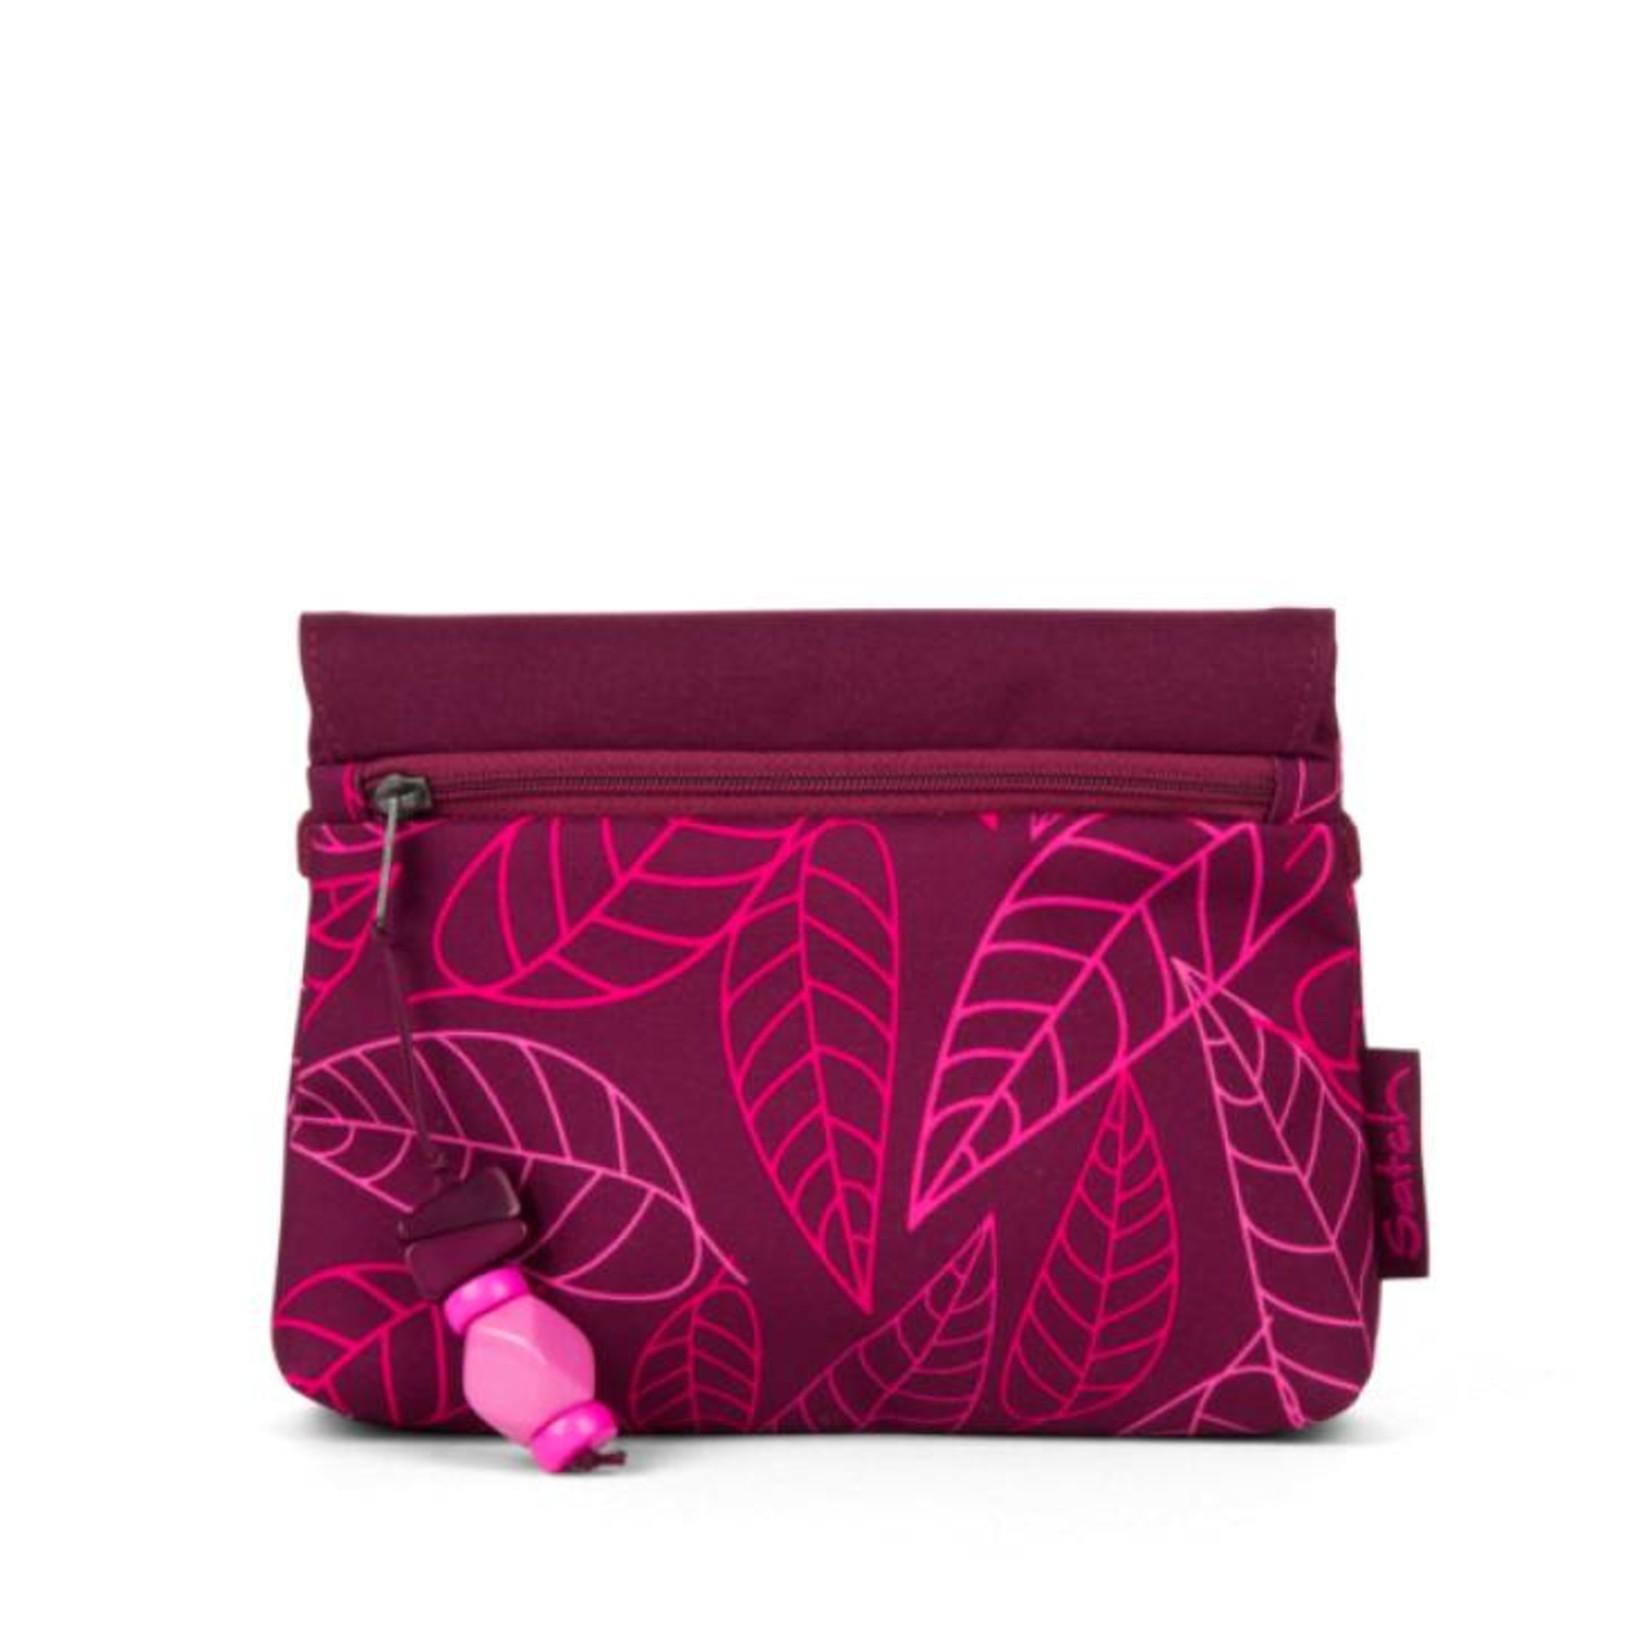 SATCH Satch KLATSCH Clutch Purple Leaves lila rosa Blätte